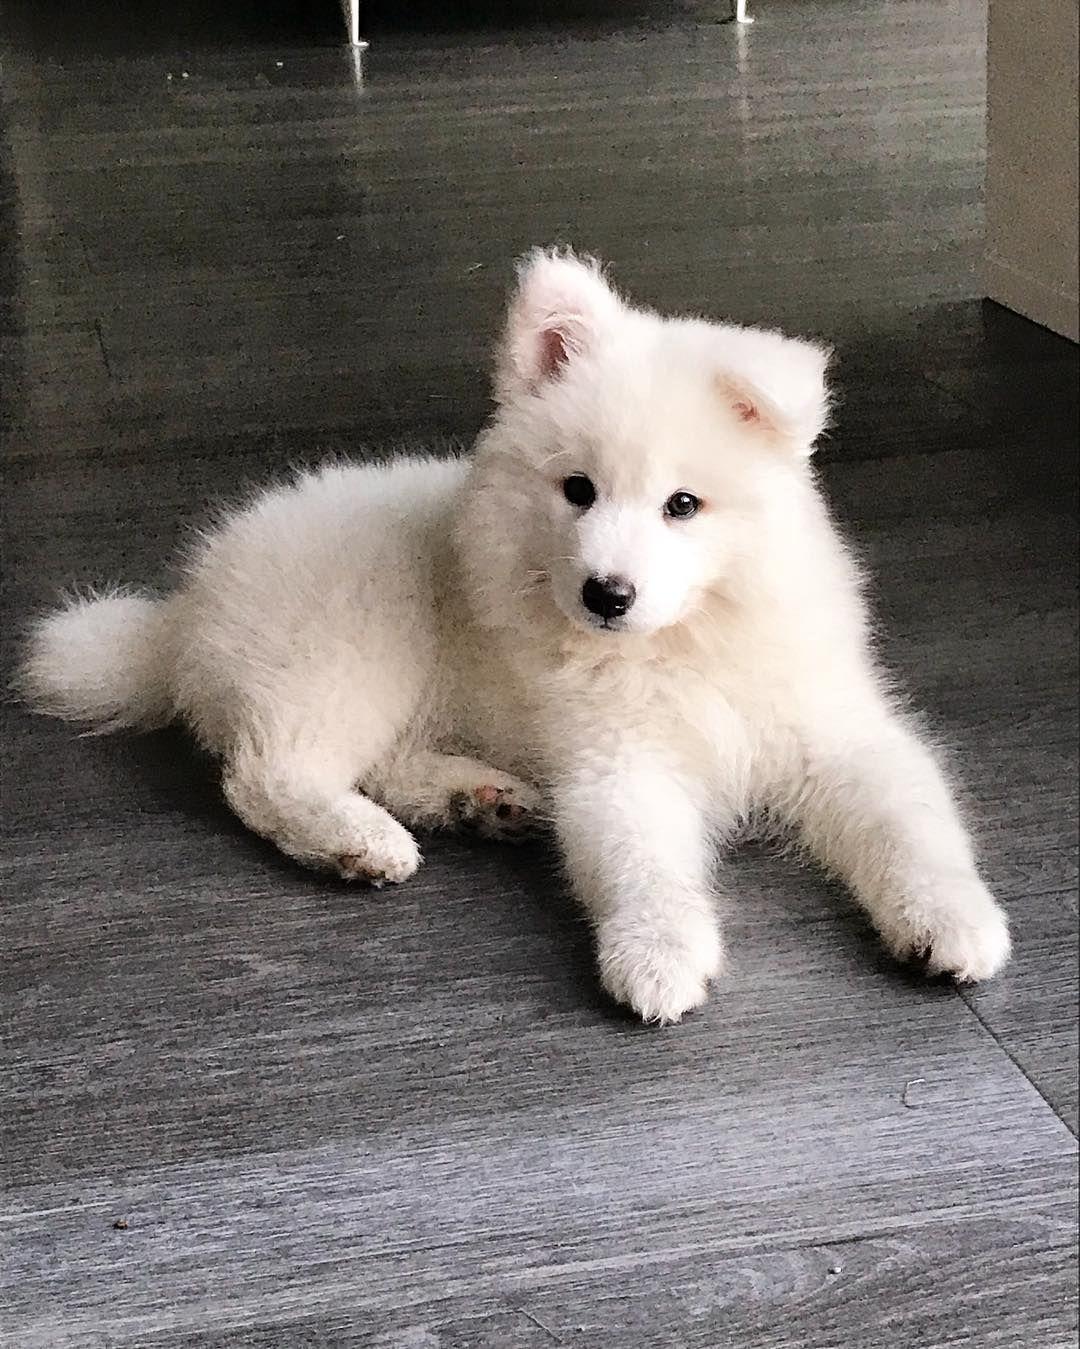 Juna Eisbar Welpe Hund Puppy Dog Samojede Samojed Dog Sweet Cute Baby Animals Bear Puppy Fluffy Dogs